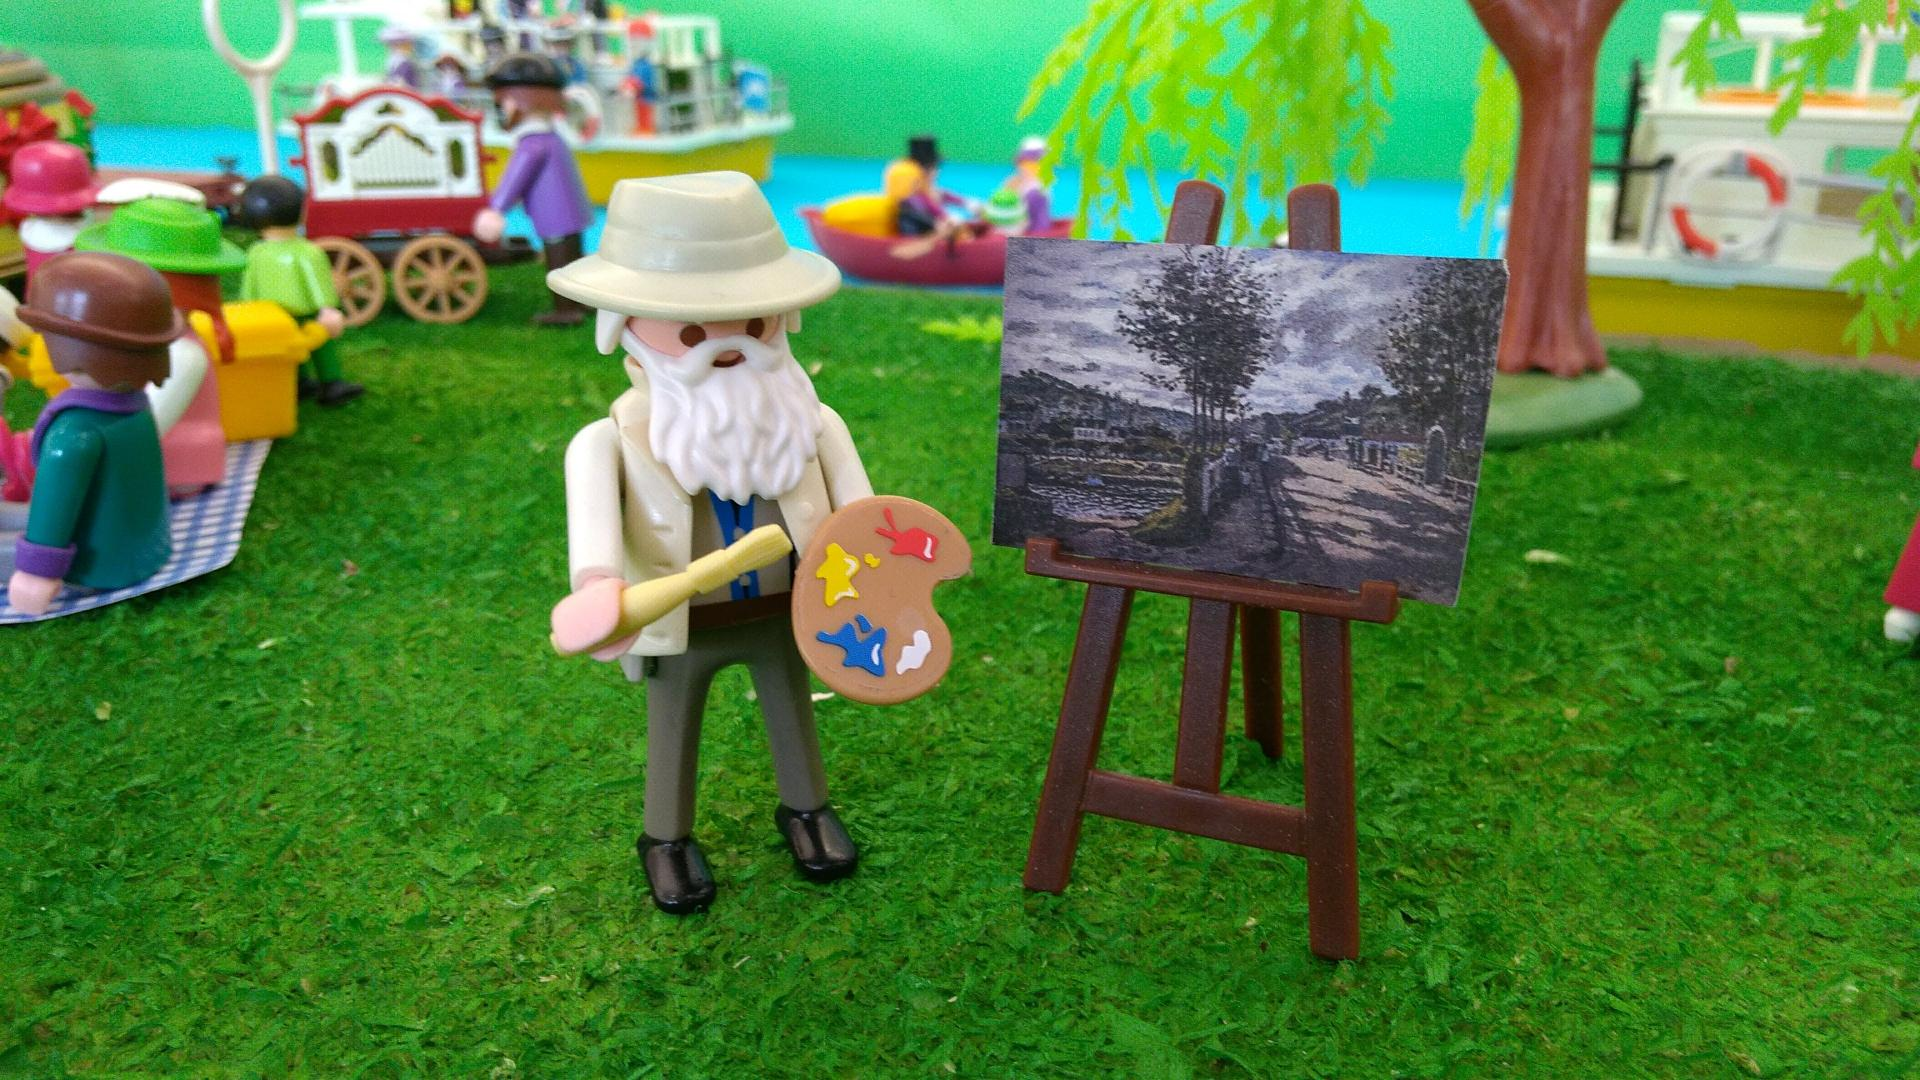 Playmobil jean monet dominique bethune exposition bougival